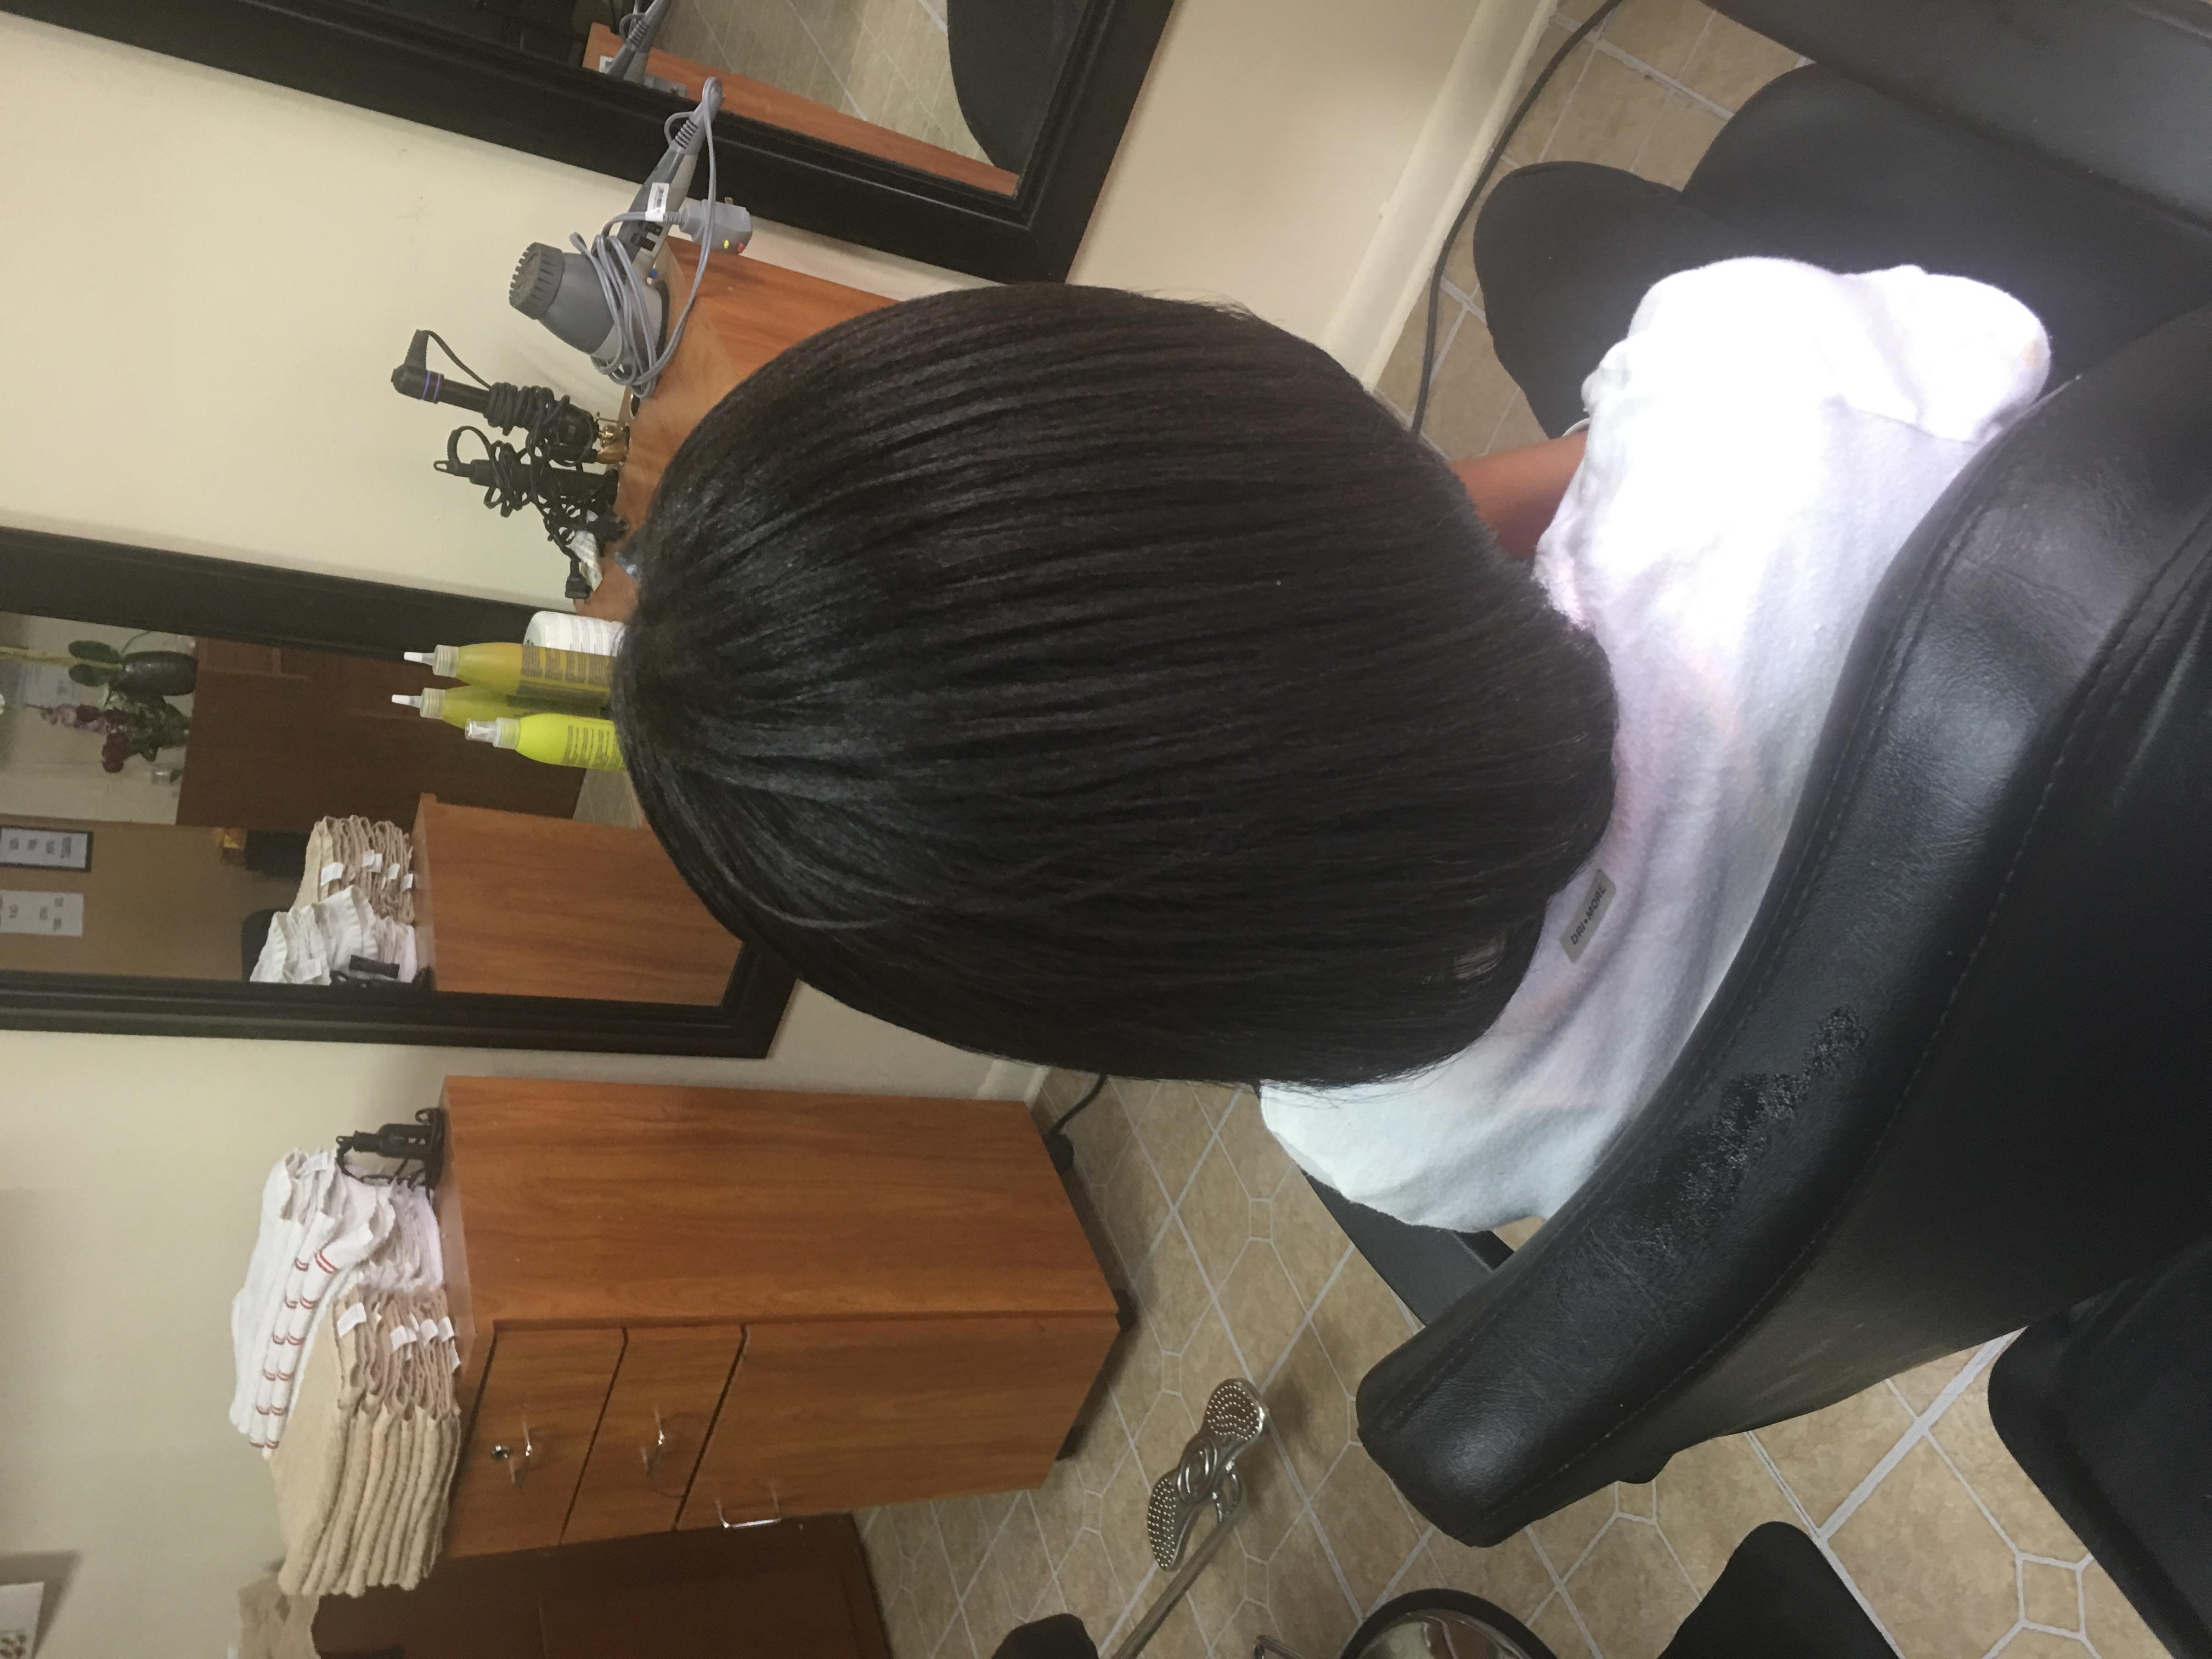 Bella S Dominican Hair Salon 2345 Flat Shoals Rd Se